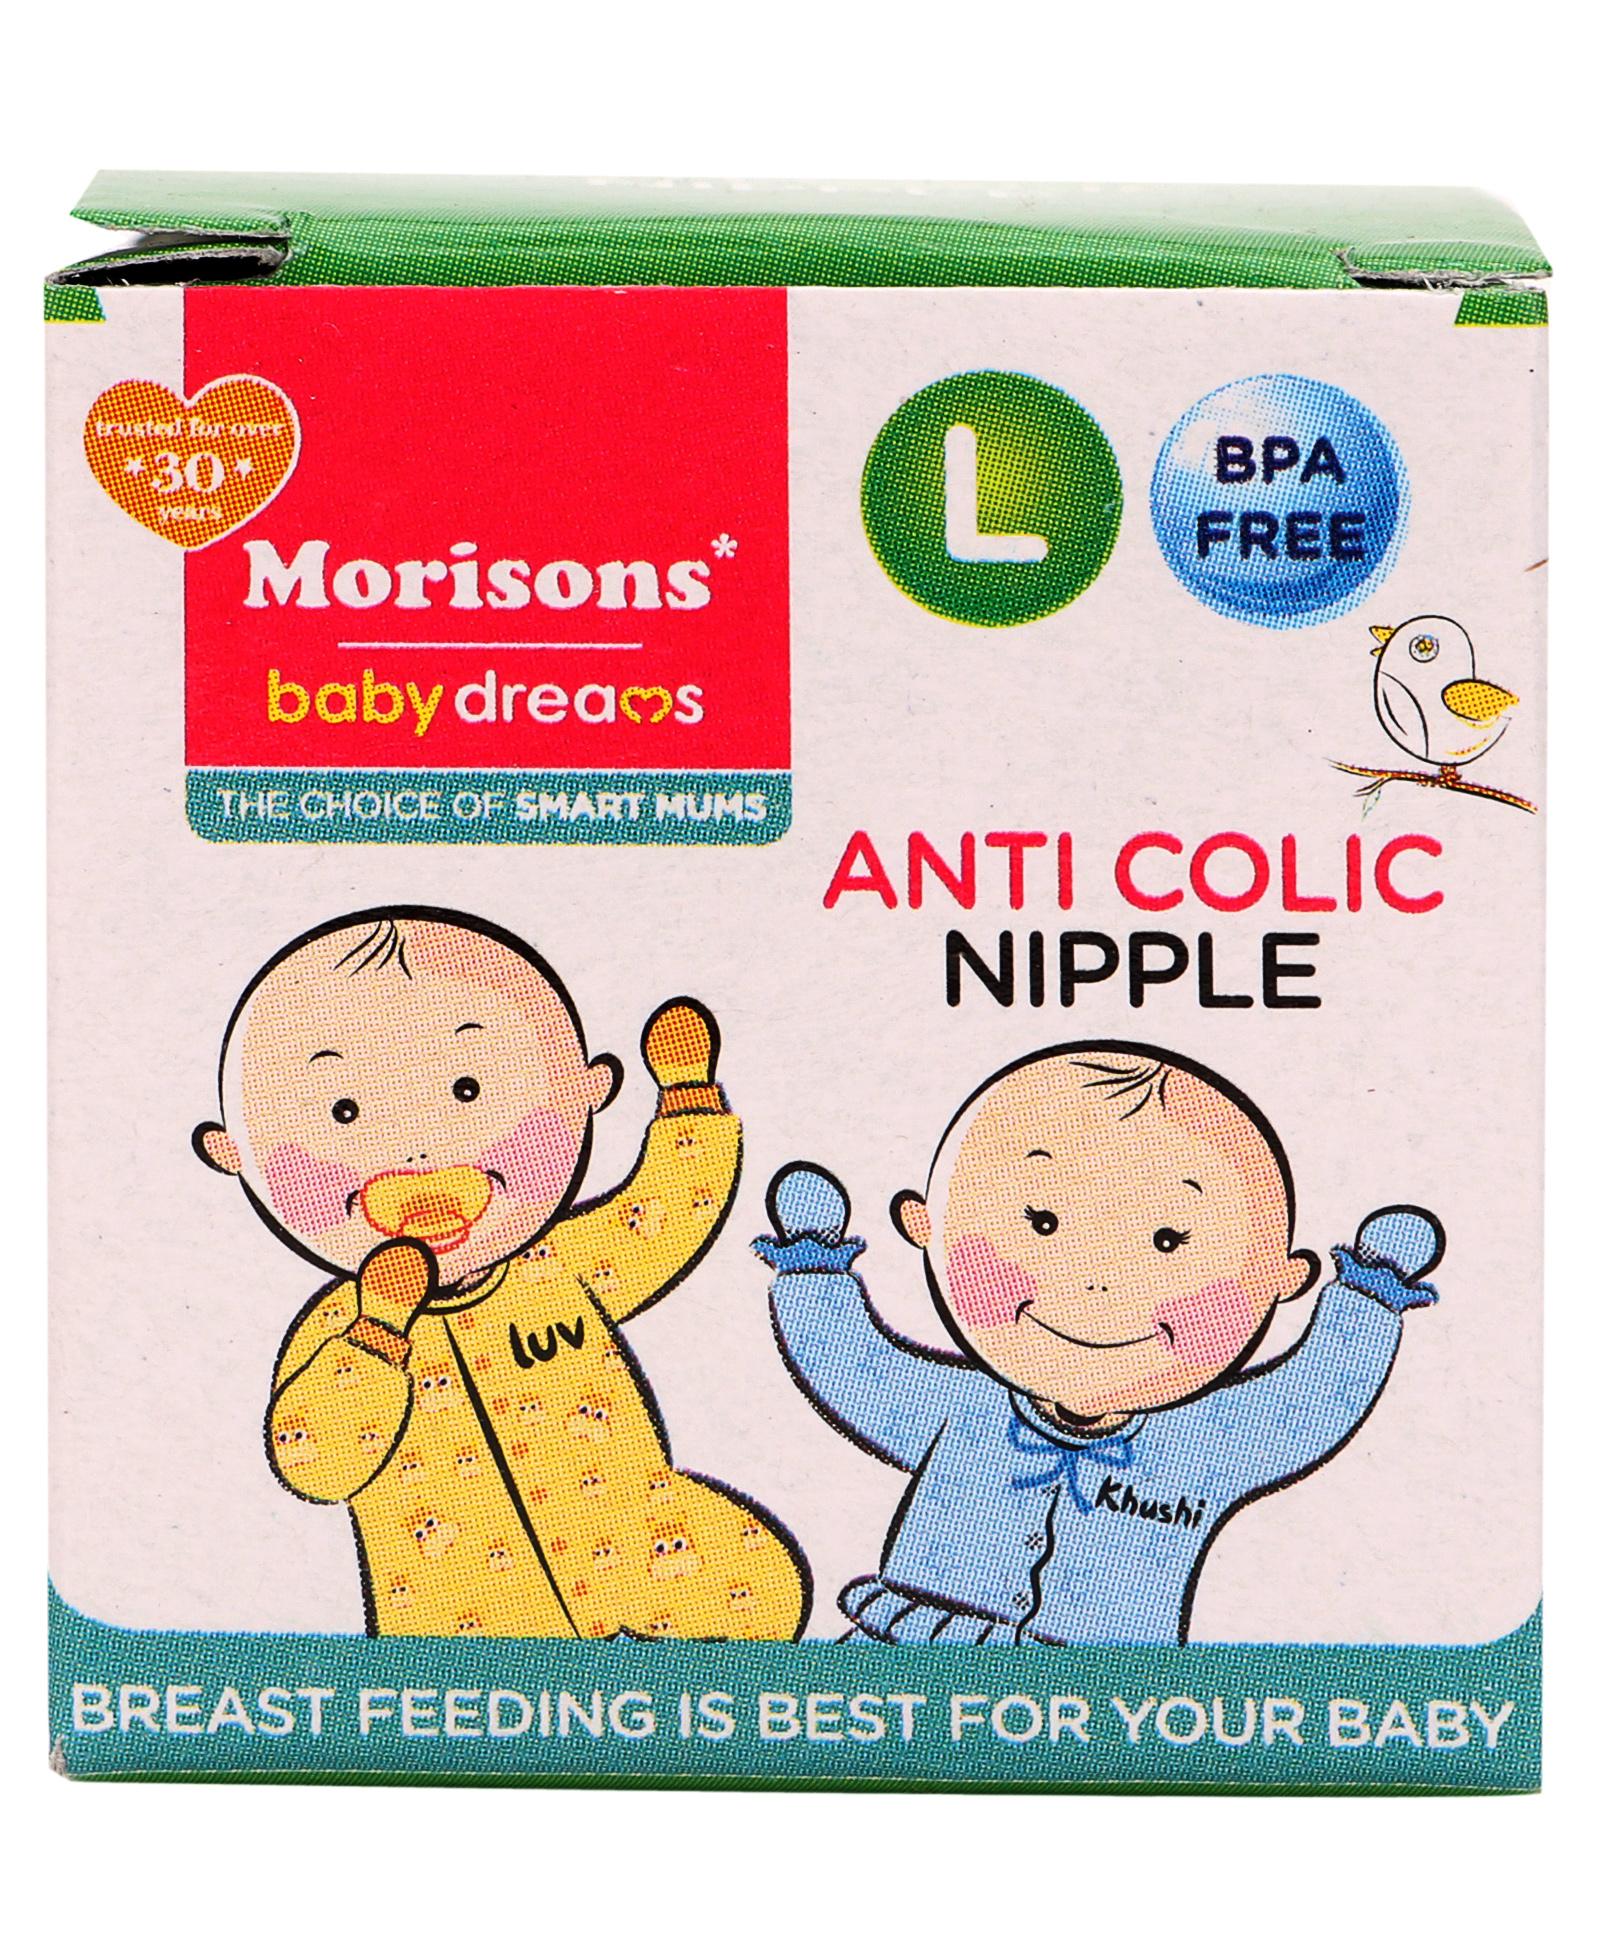 Morisons anti colic nipple